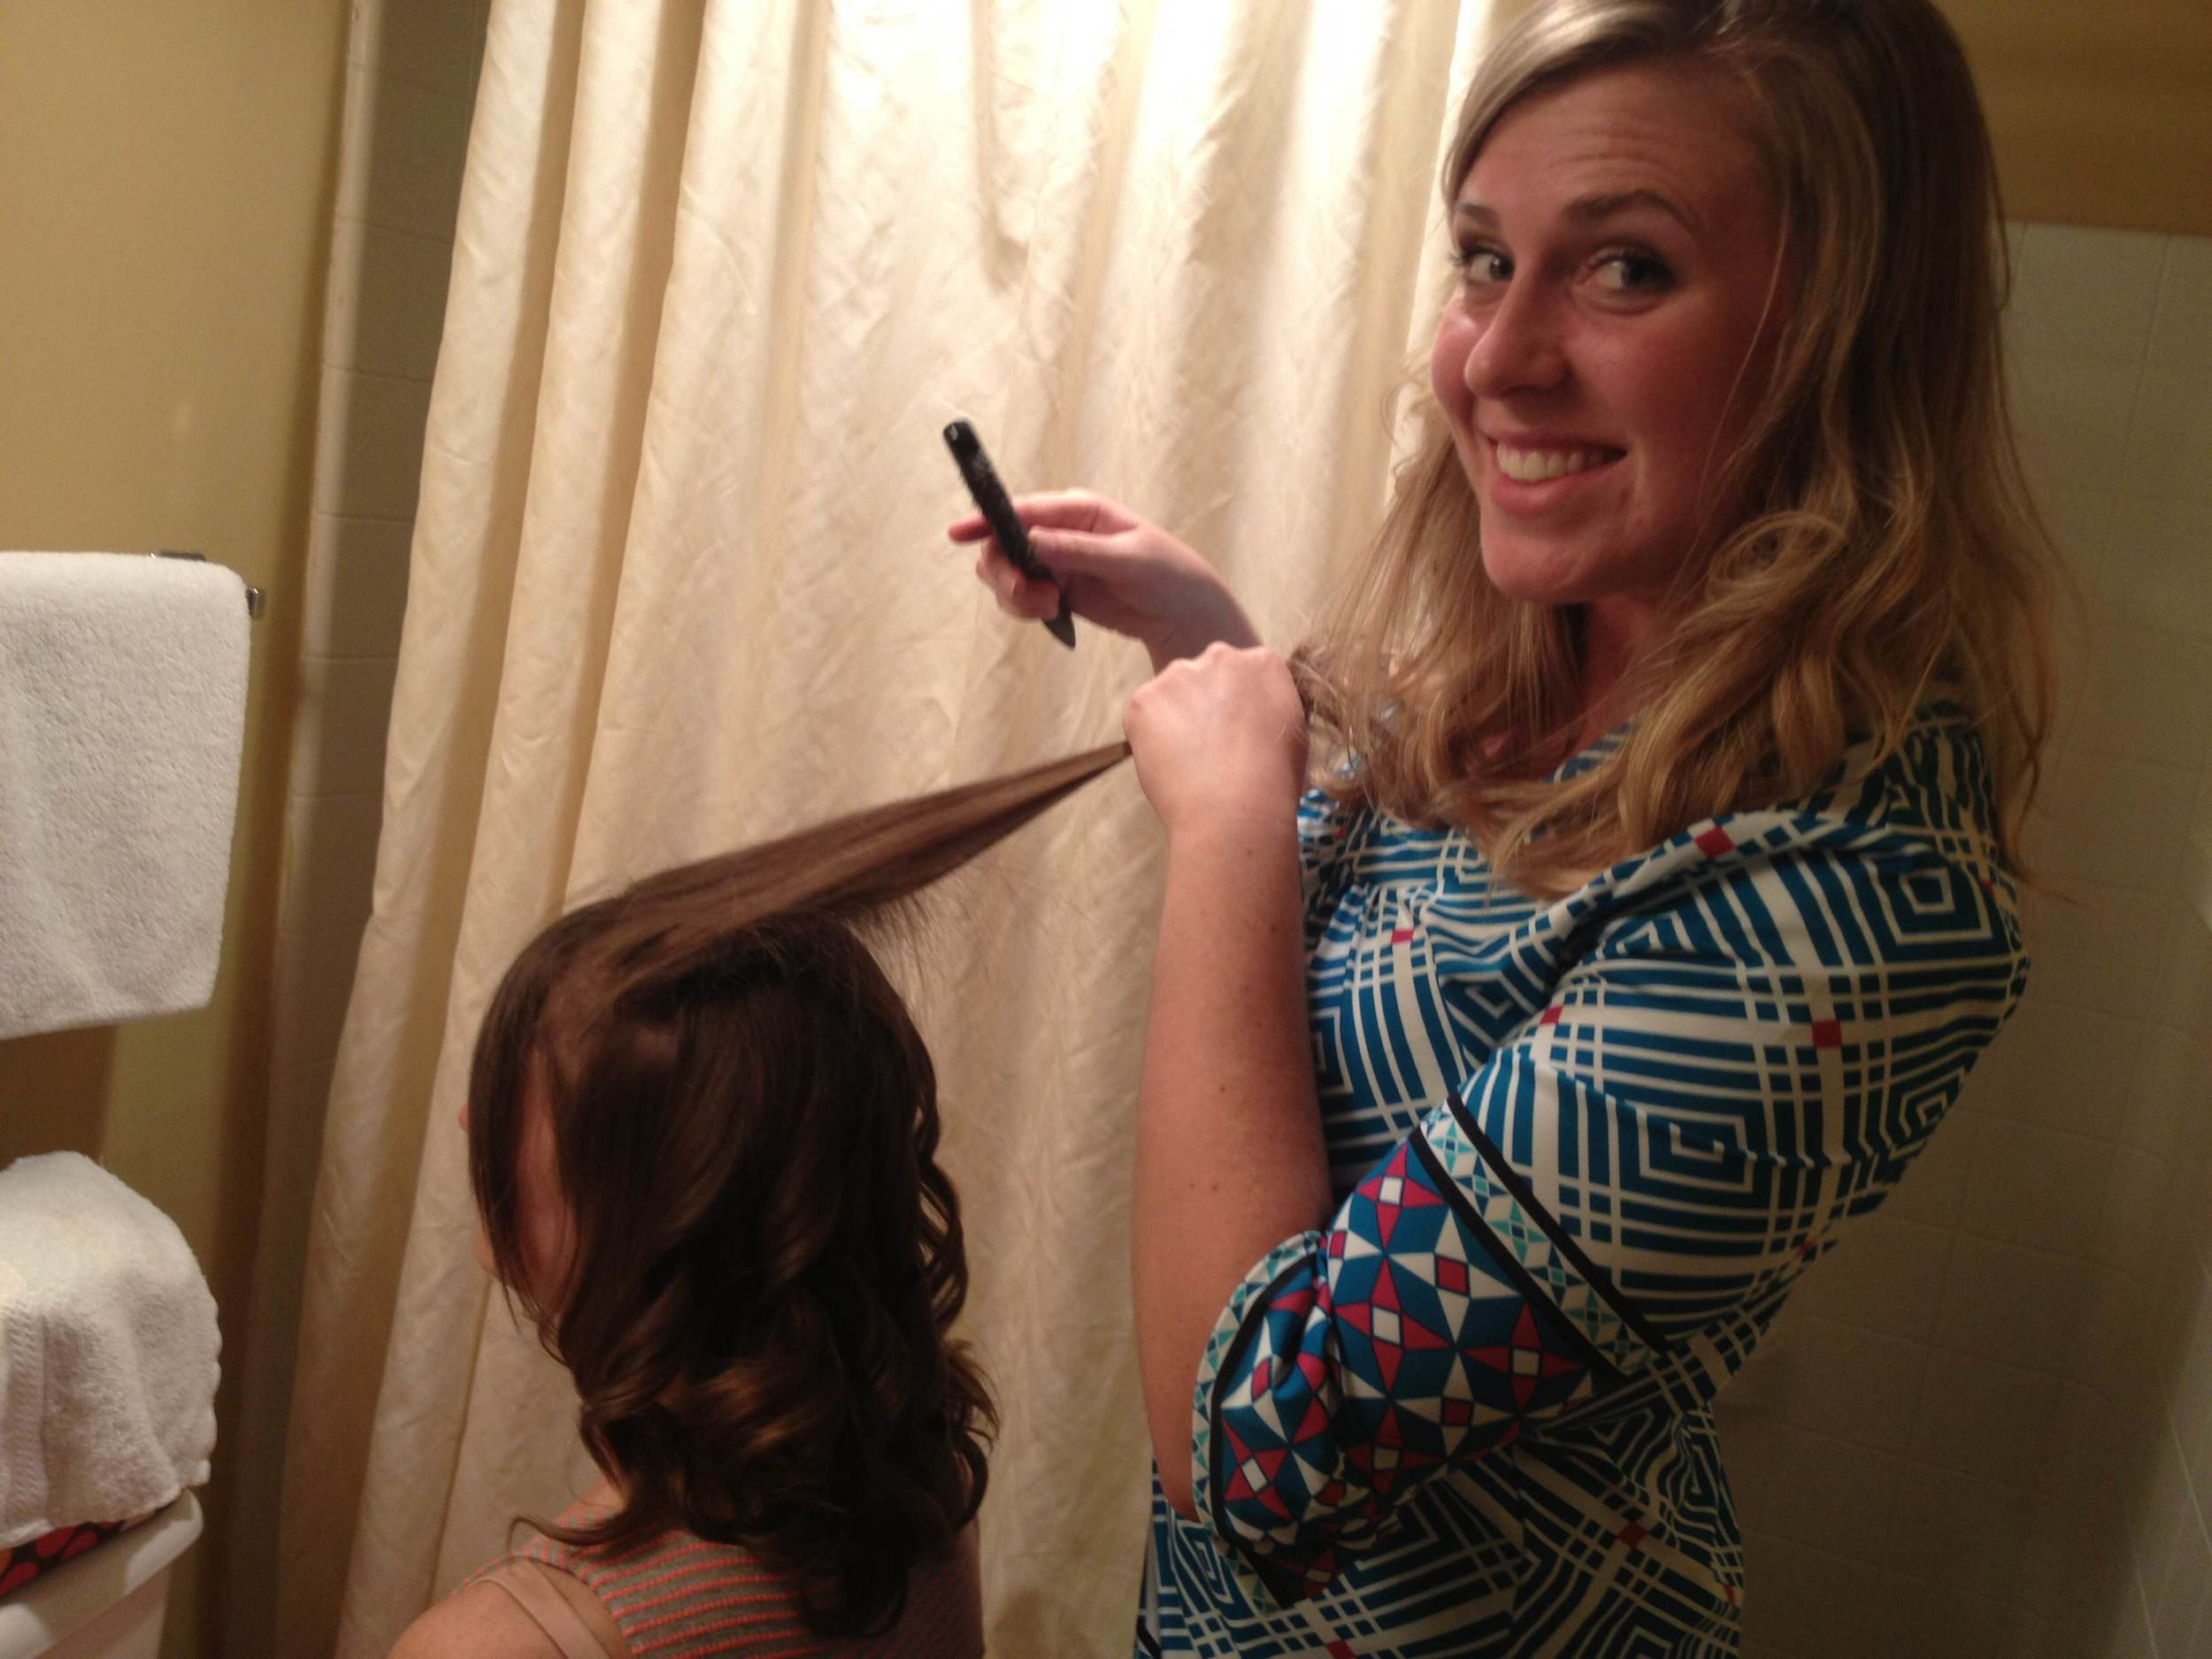 Not just a wedding planner! Shhh